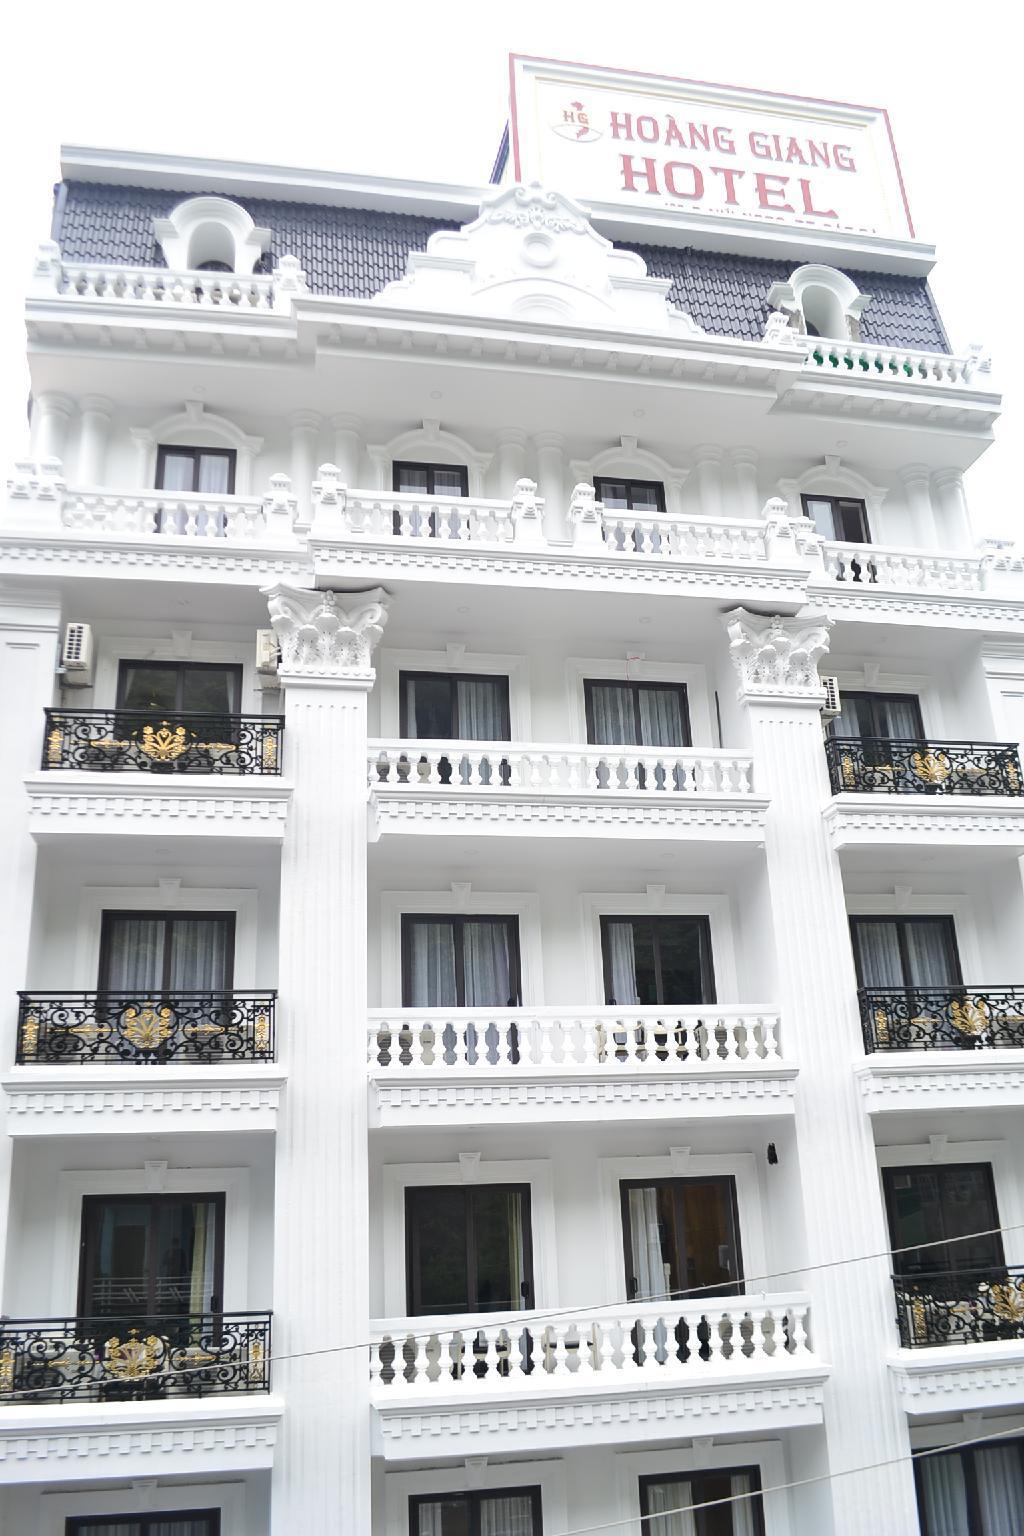 Hoang Giang Hotel, Cát Hải